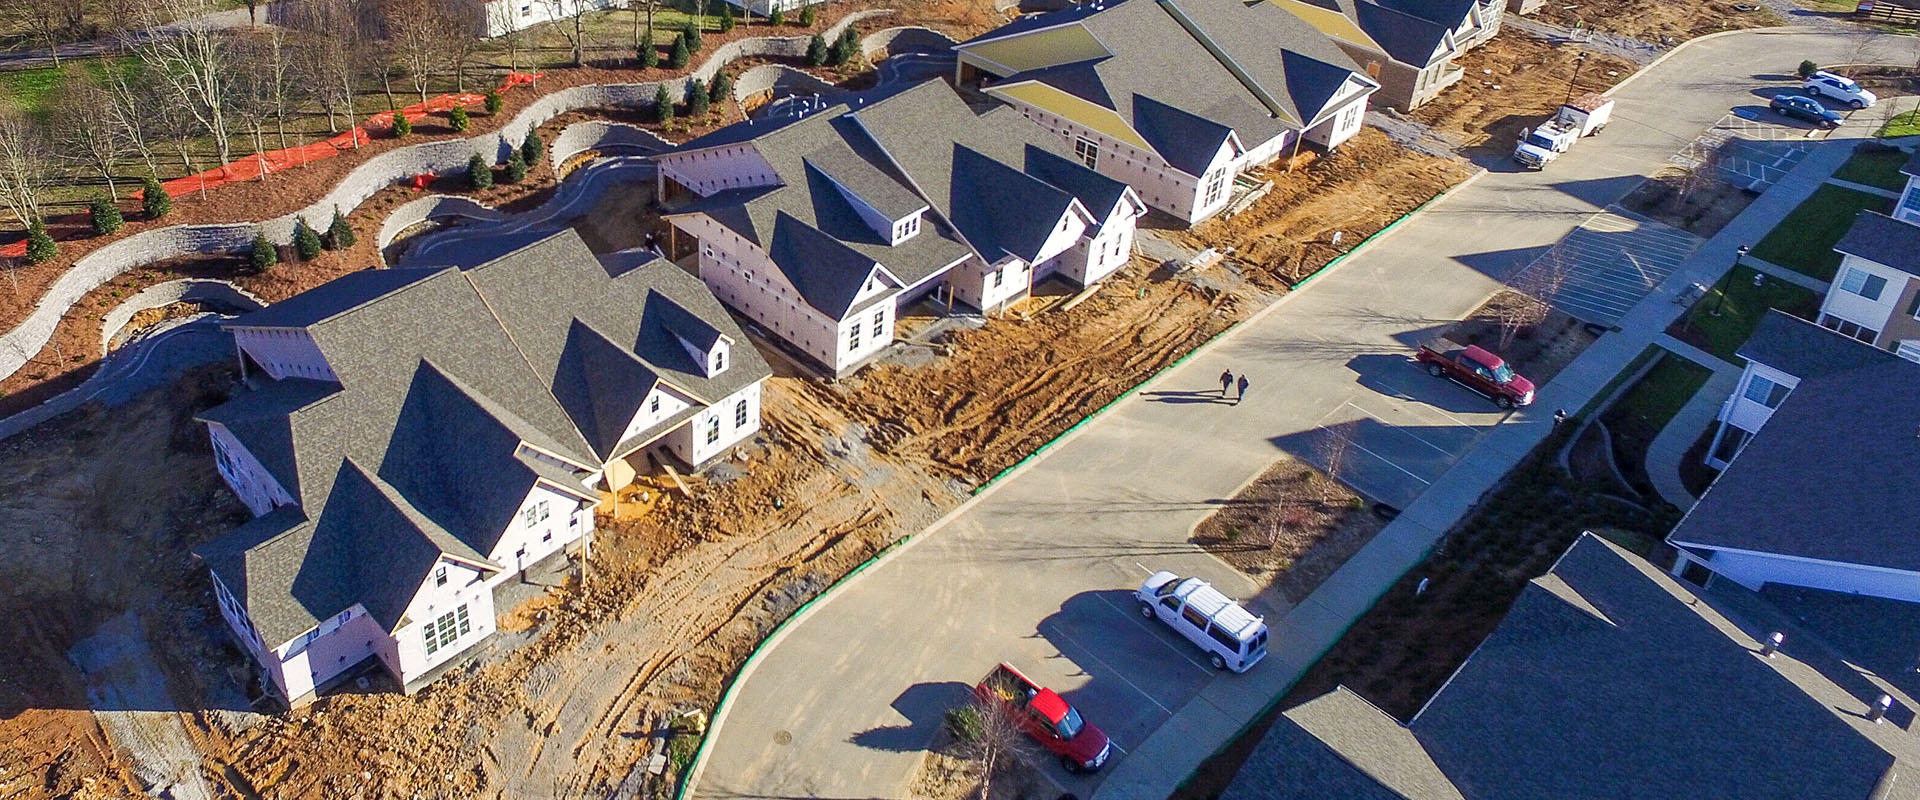 Property Management and Development | Brindley Construction